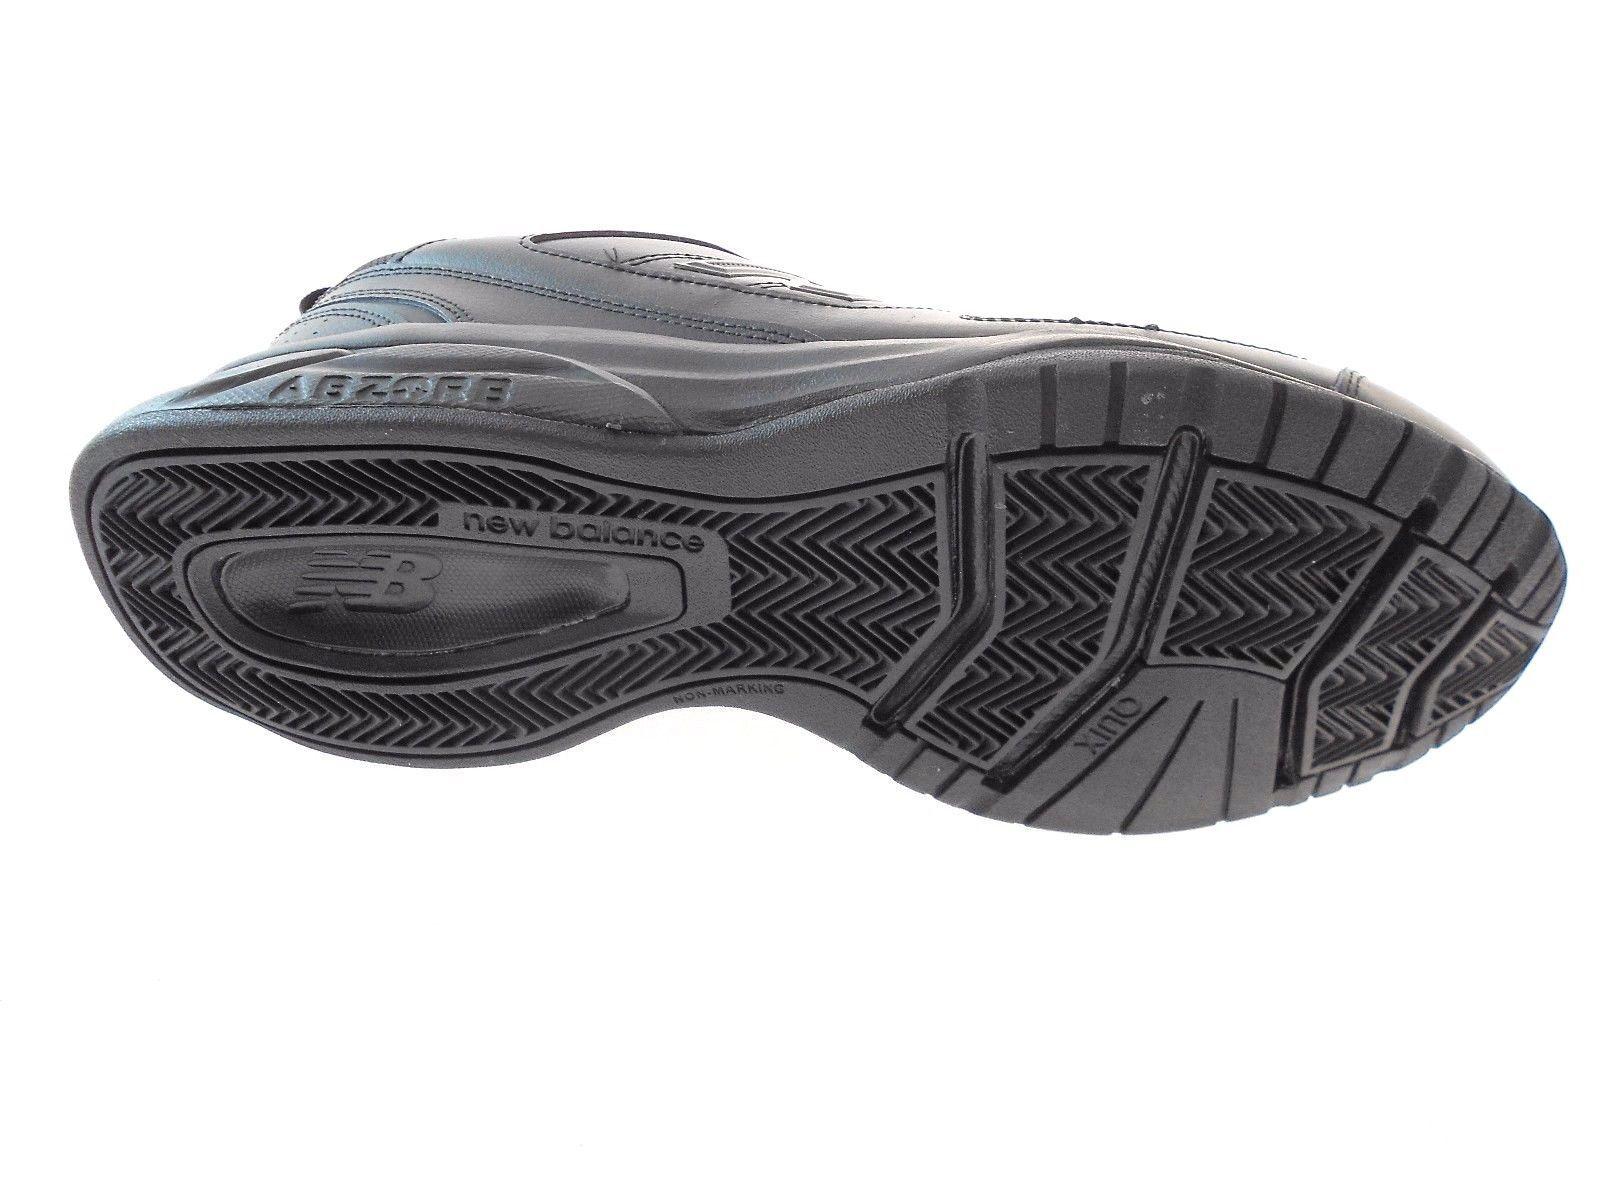 NEW BALANCE 623v3 MEN'S BLACK LEATHER SNEAKER, #MX623AB3